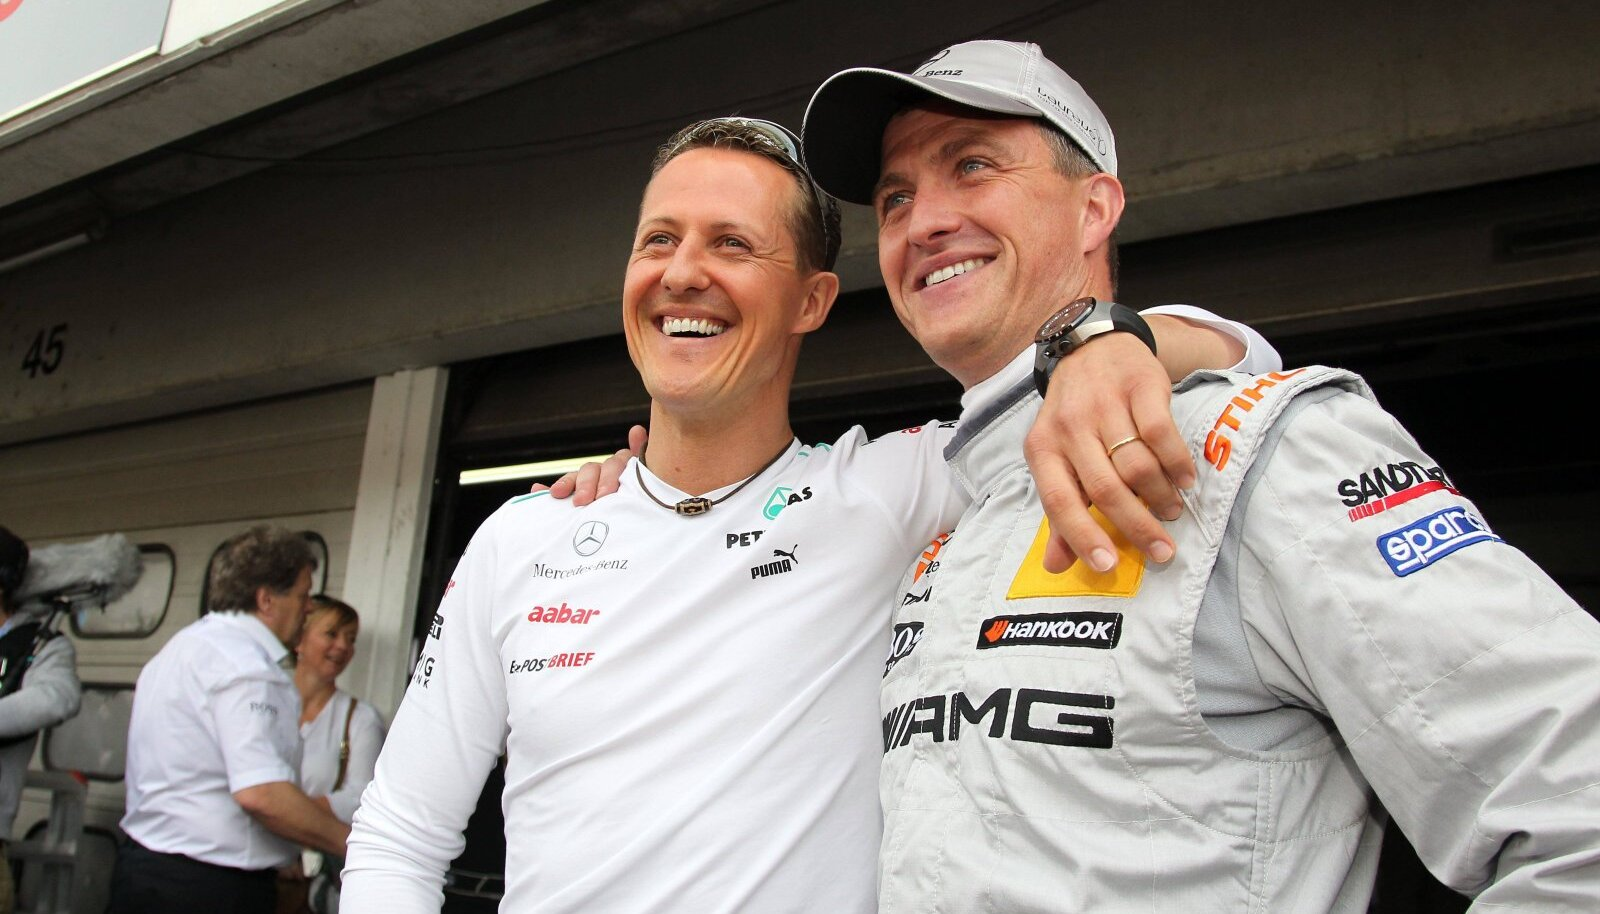 Michael ja Ralf Schumacher